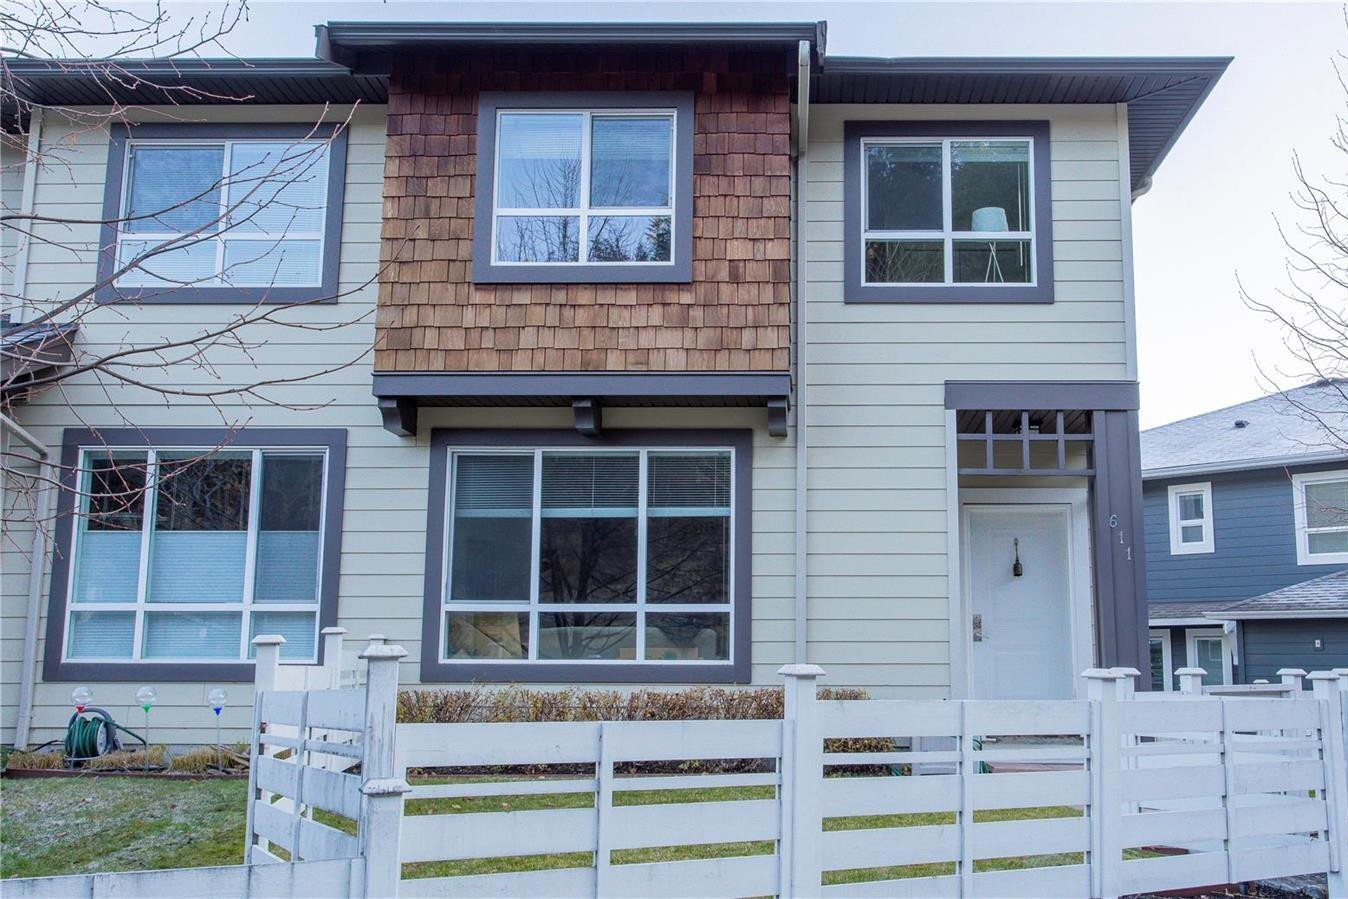 Townhouse for sale at 611 Boynton Pl Kelowna British Columbia - MLS: 10221330